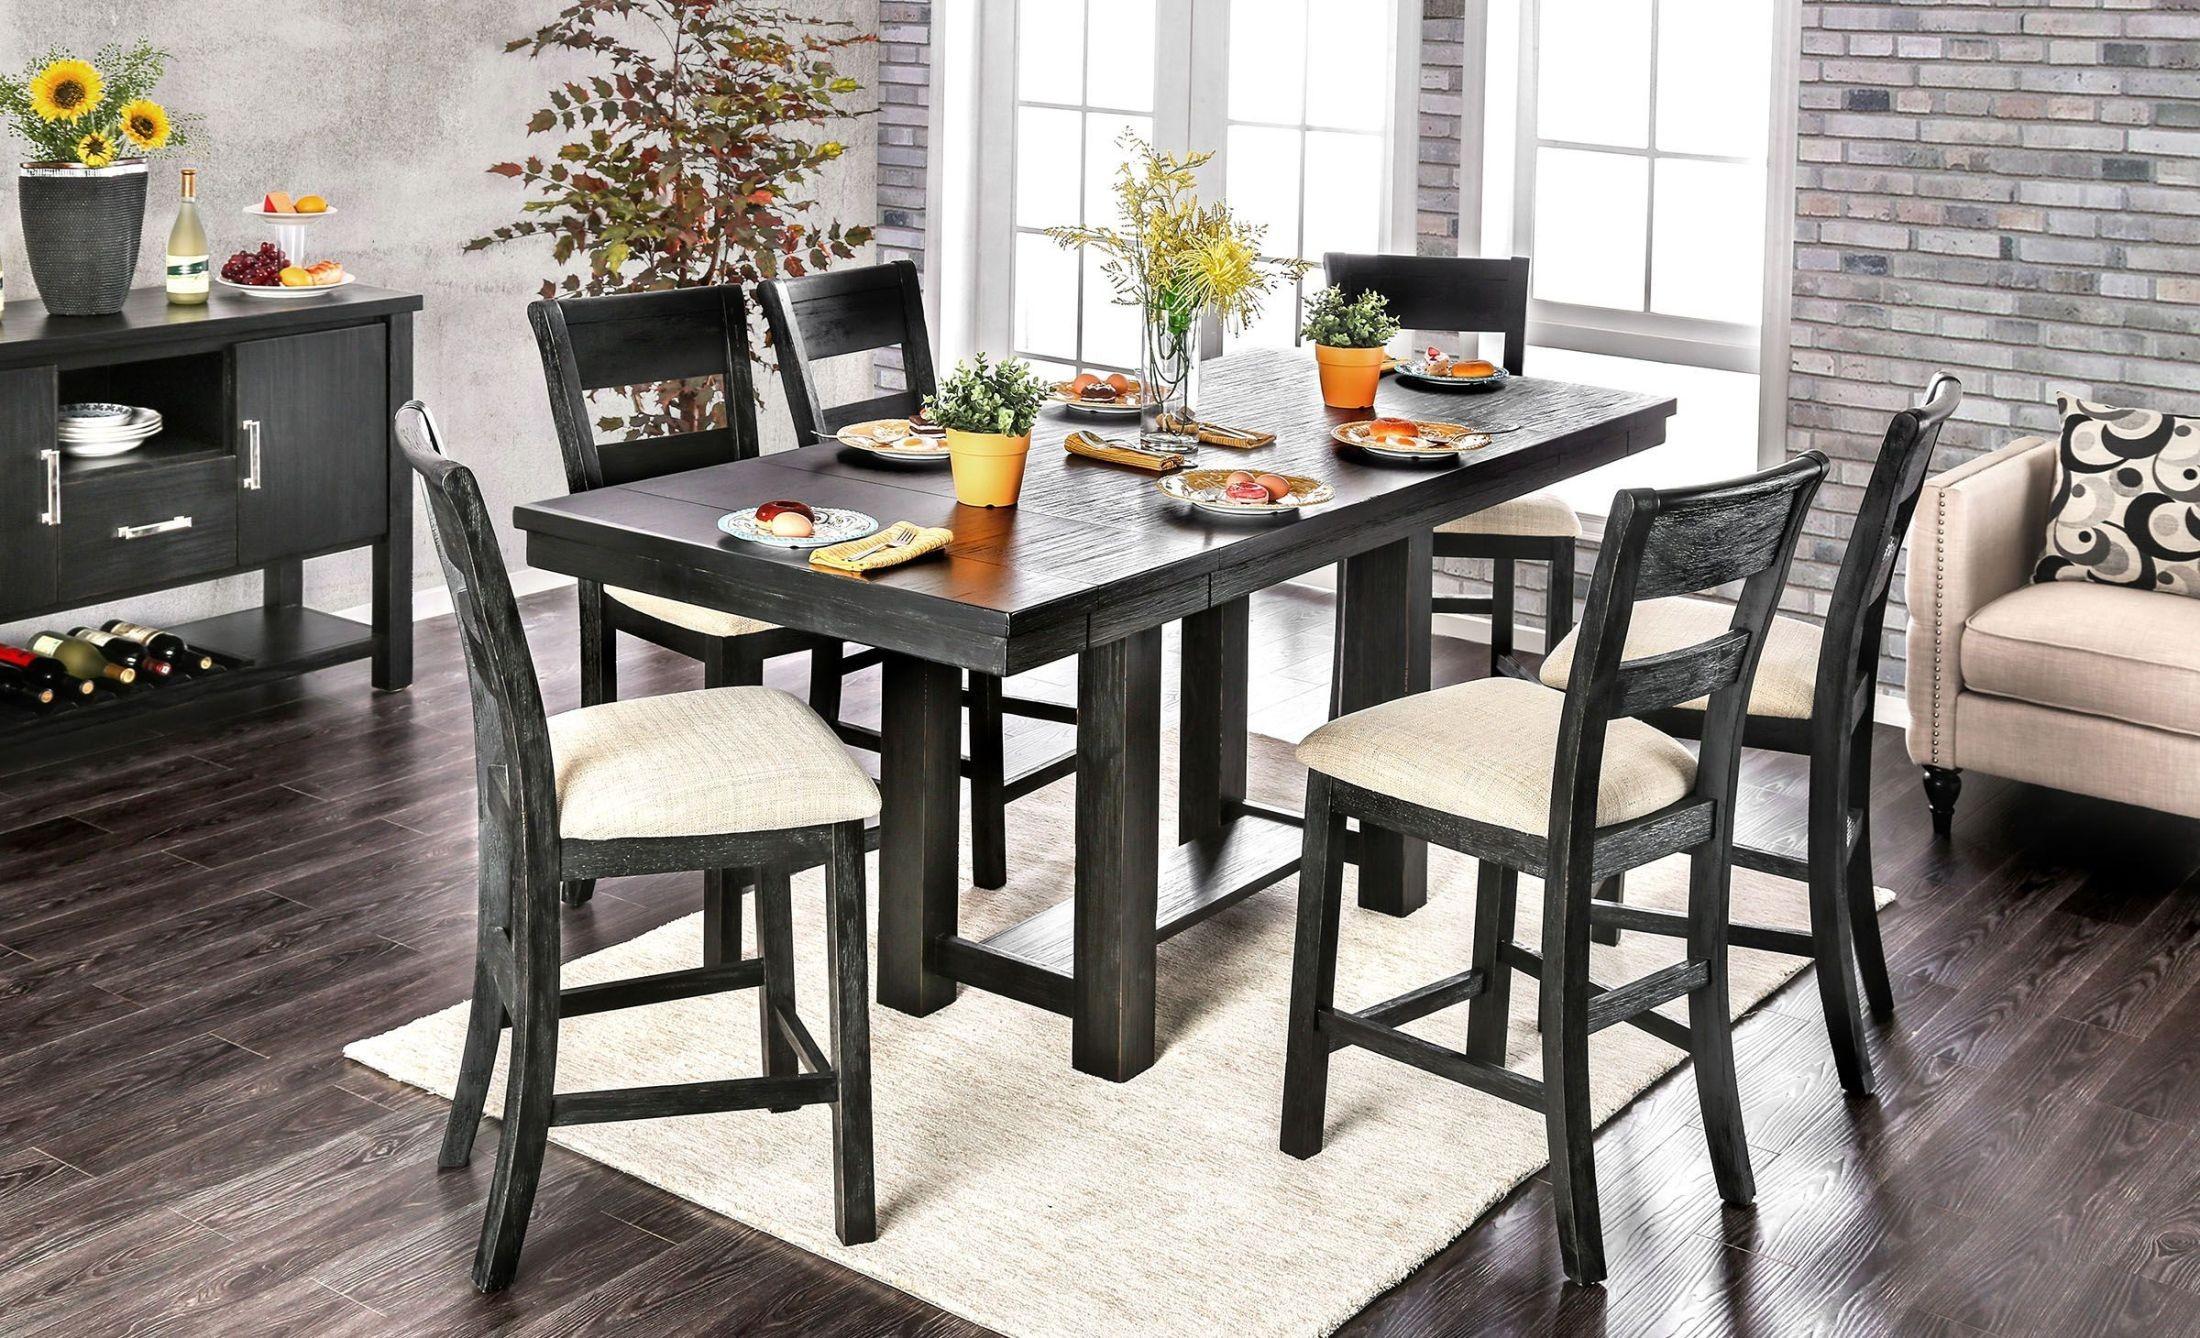 thomaston brushed black counter height dining room set cm3543pt table furniture of america. Black Bedroom Furniture Sets. Home Design Ideas